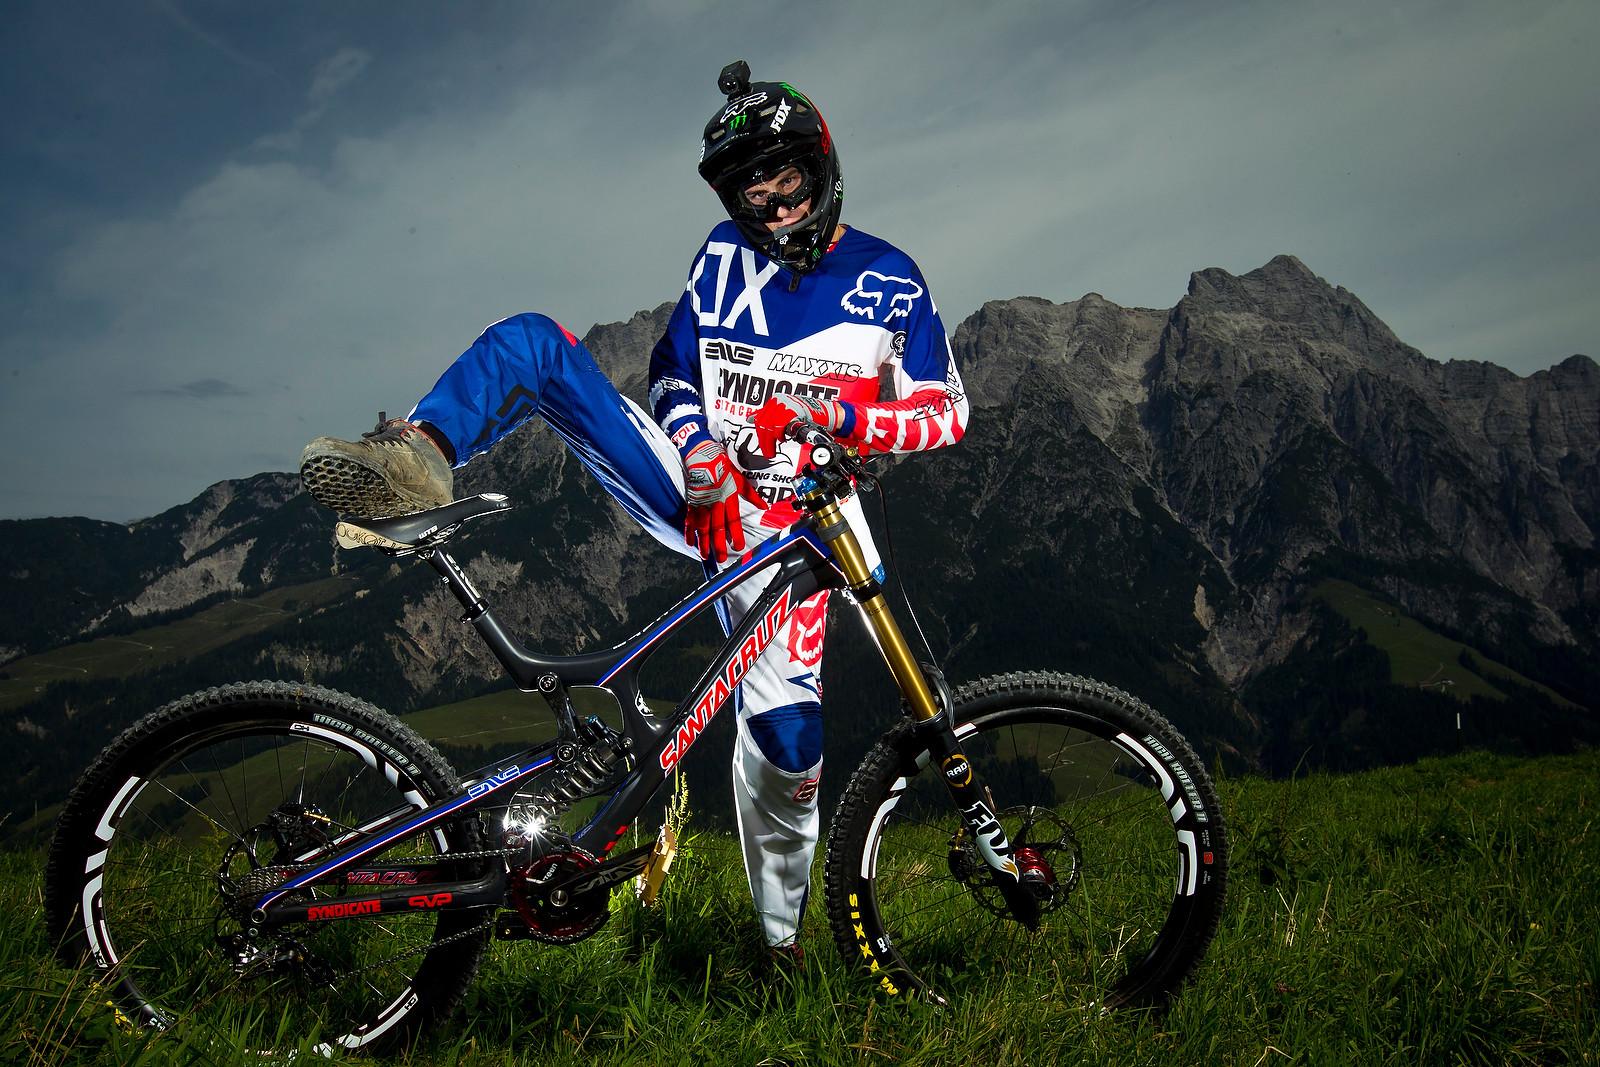 Josh Bryceland Getting a Leg Up - World Championships Riders and Bikes - Mountain Biking Pictures - Vital MTB